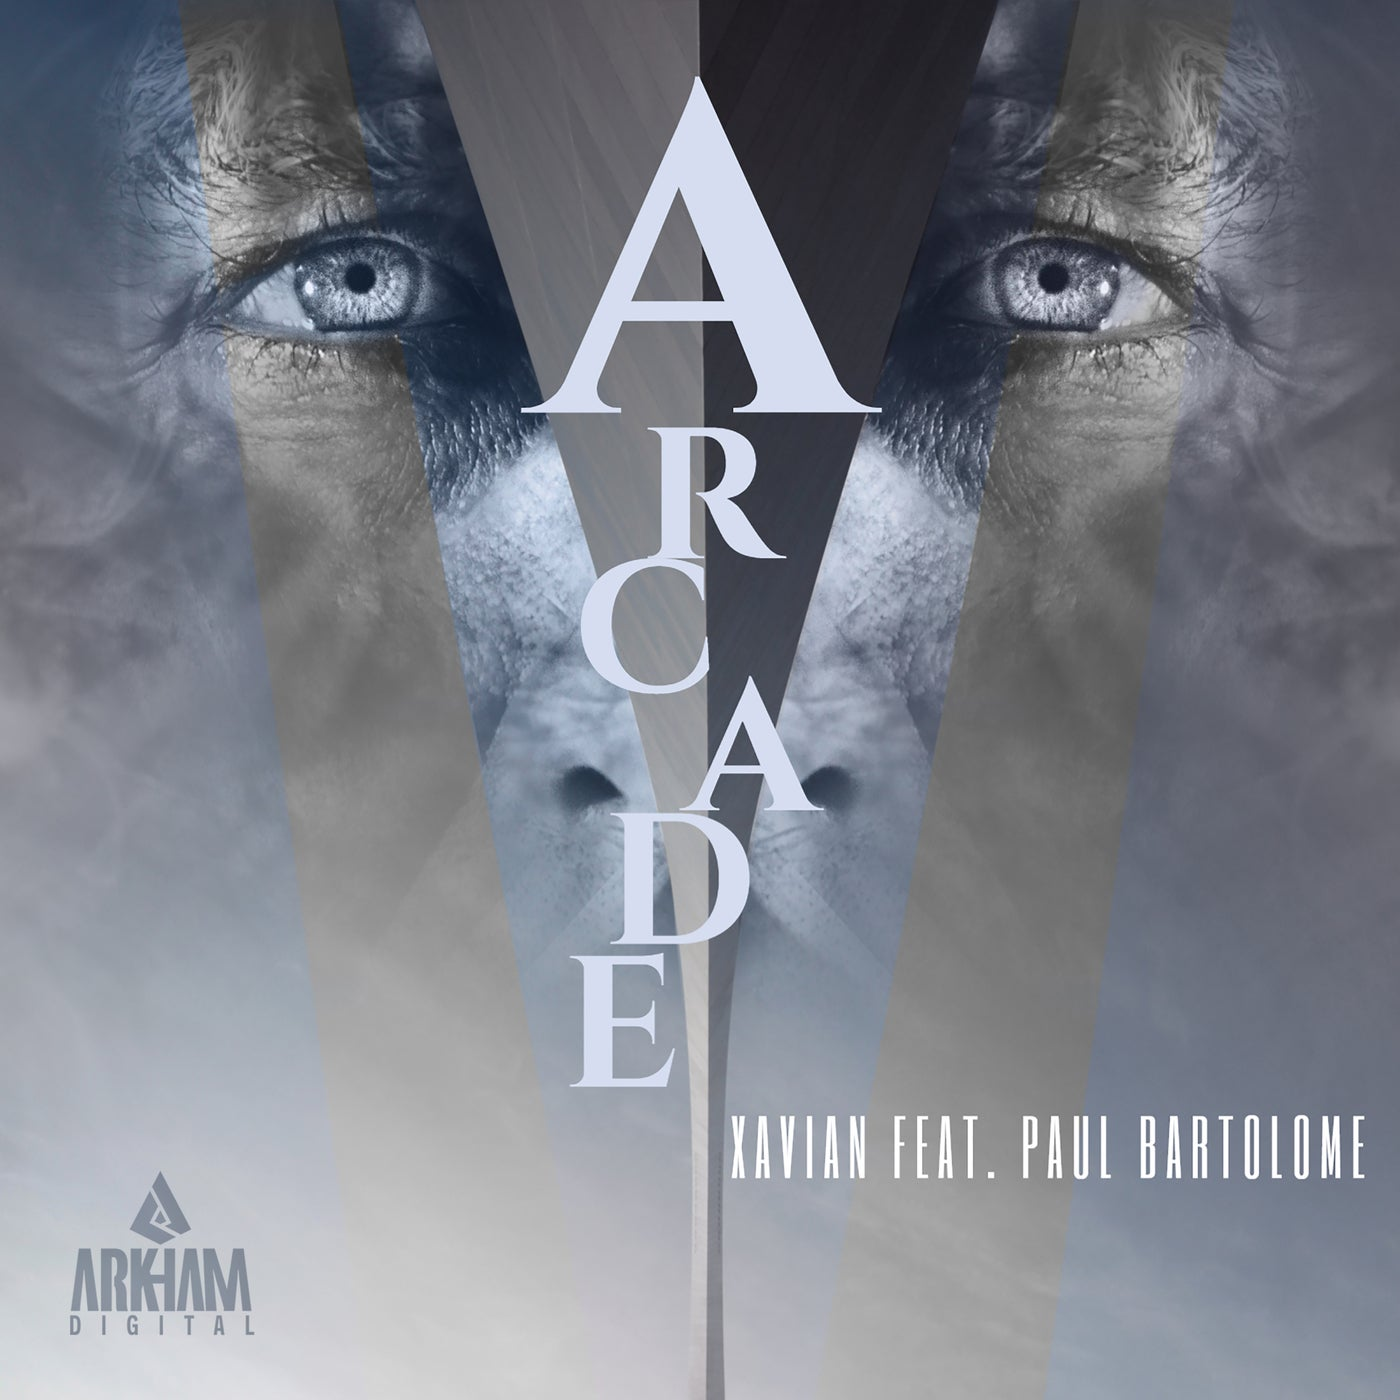 Arcade (Extended Mix)